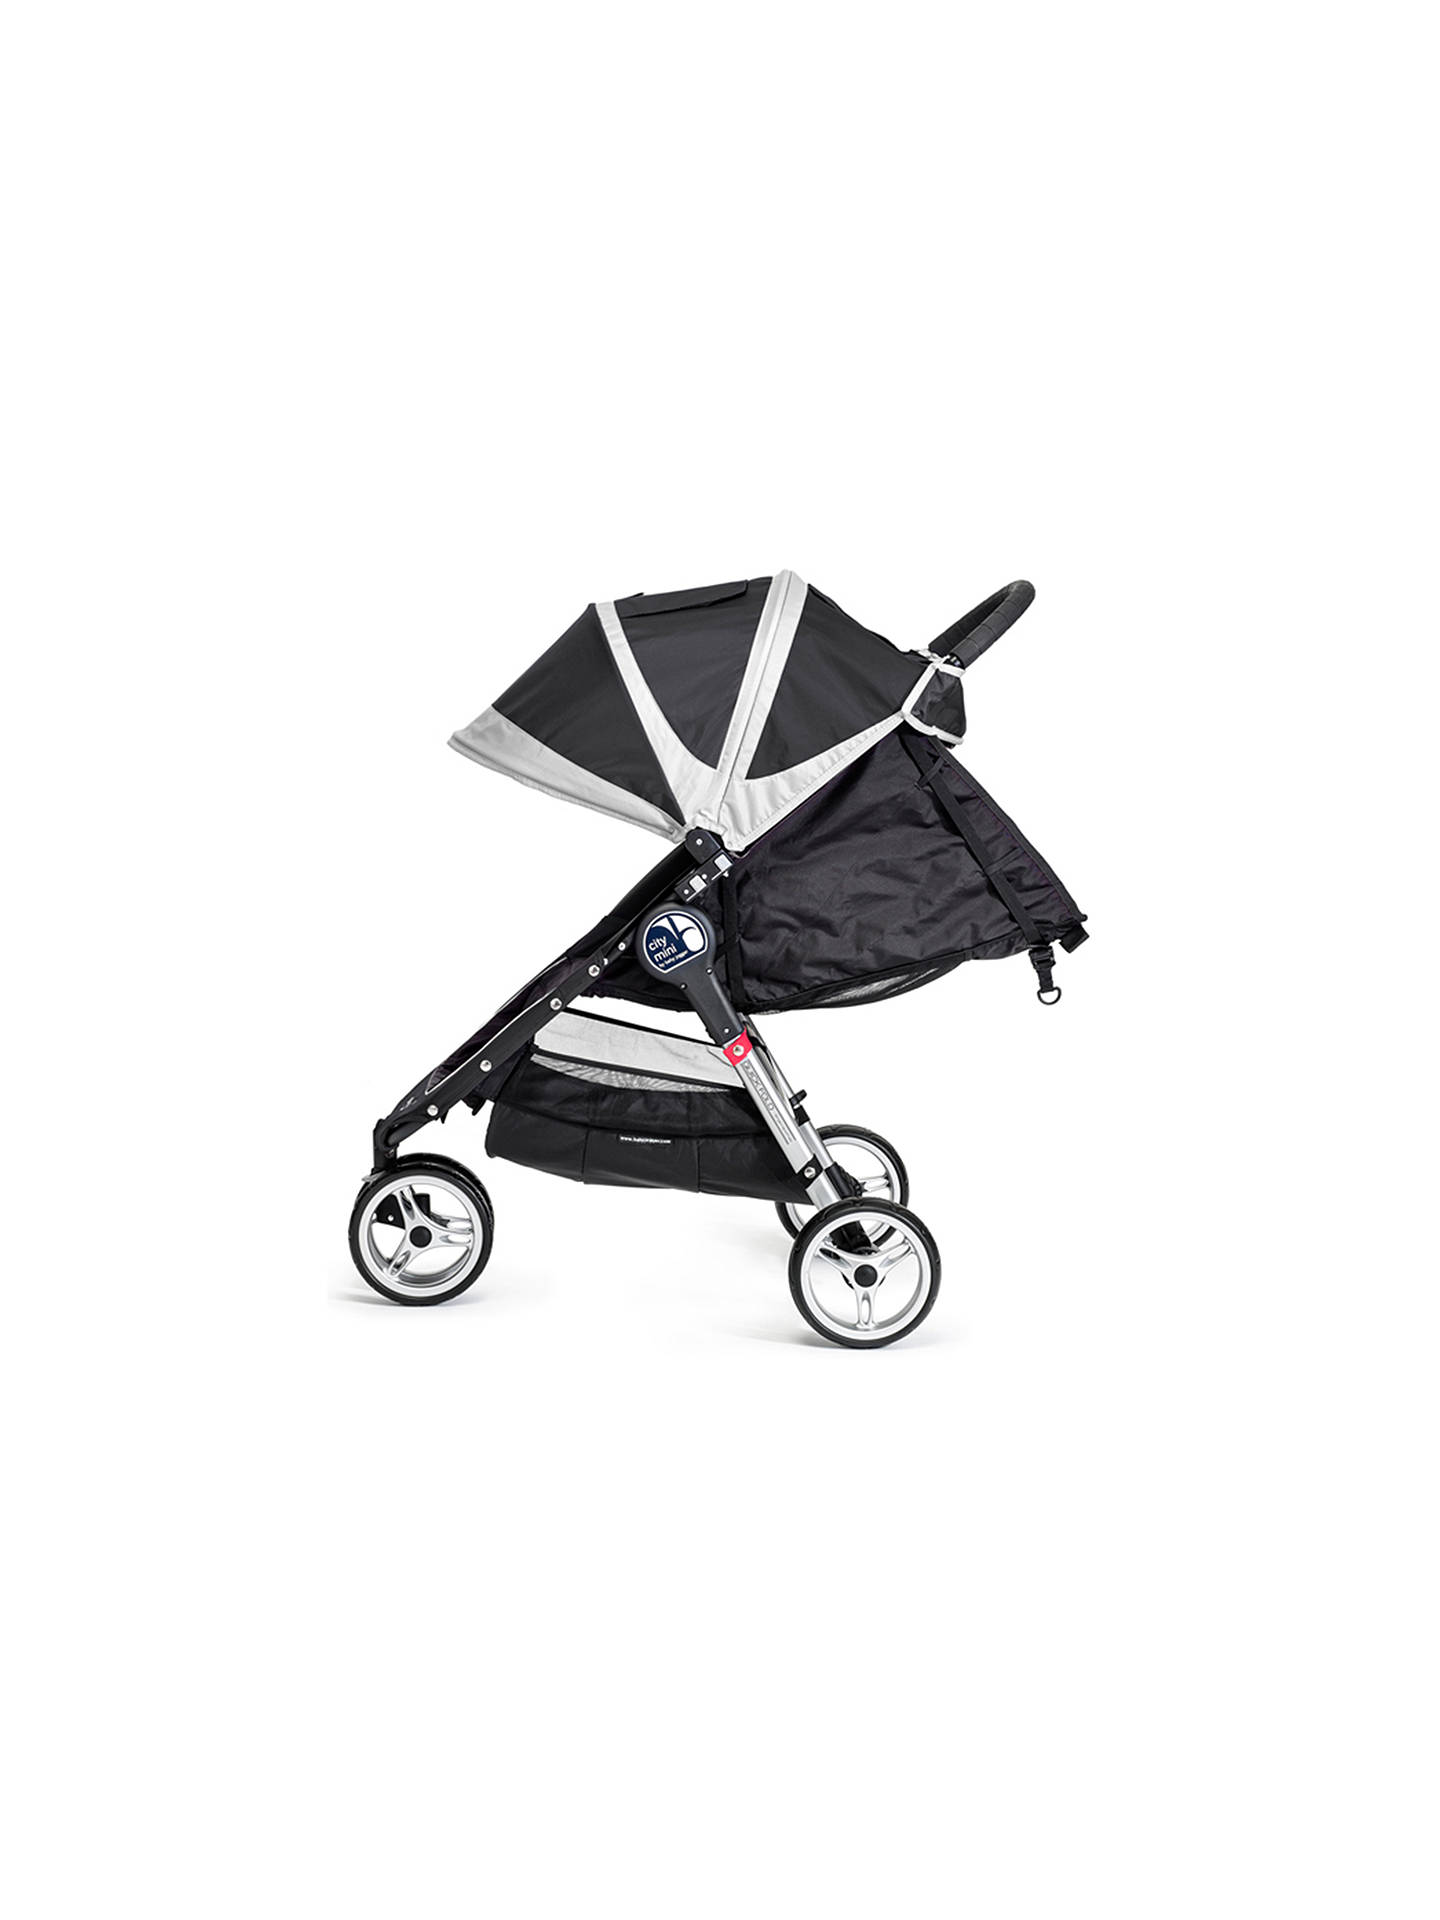 Baby Jogger City Mini 3 Wheel Pushchair Black Grey